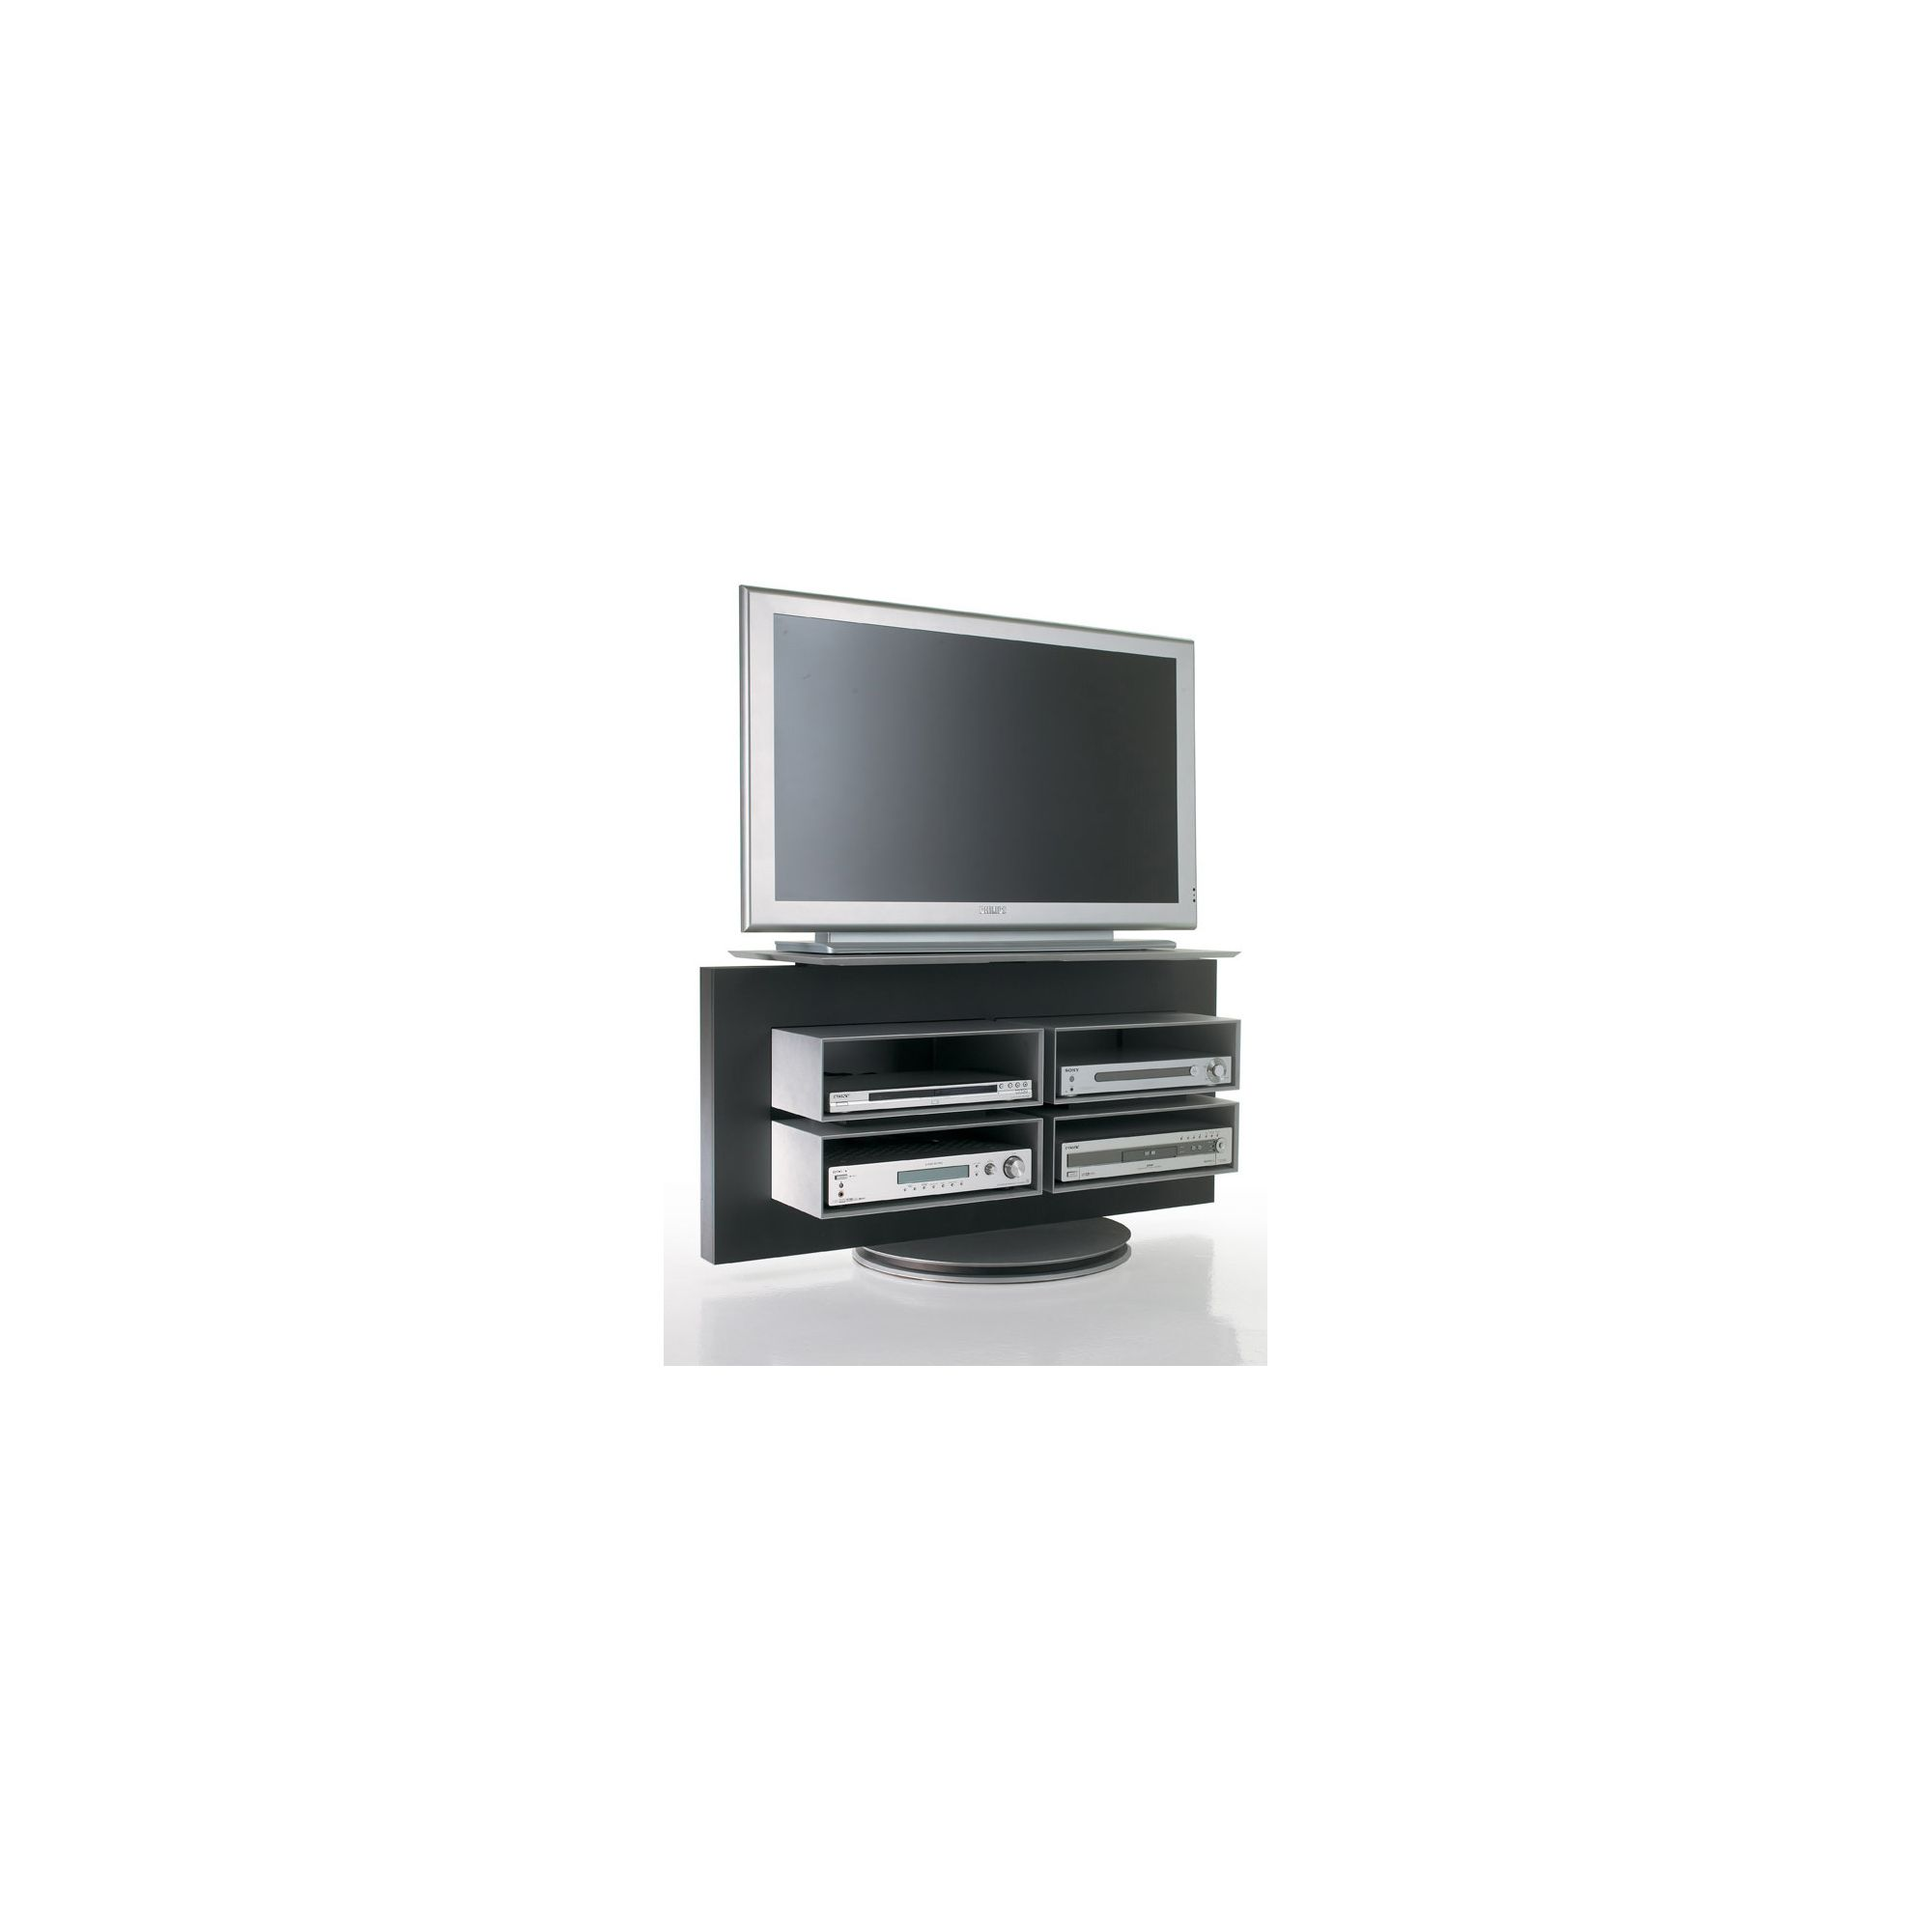 Luke Furniture TV Stand - High Gloss Black at Tesco Direct